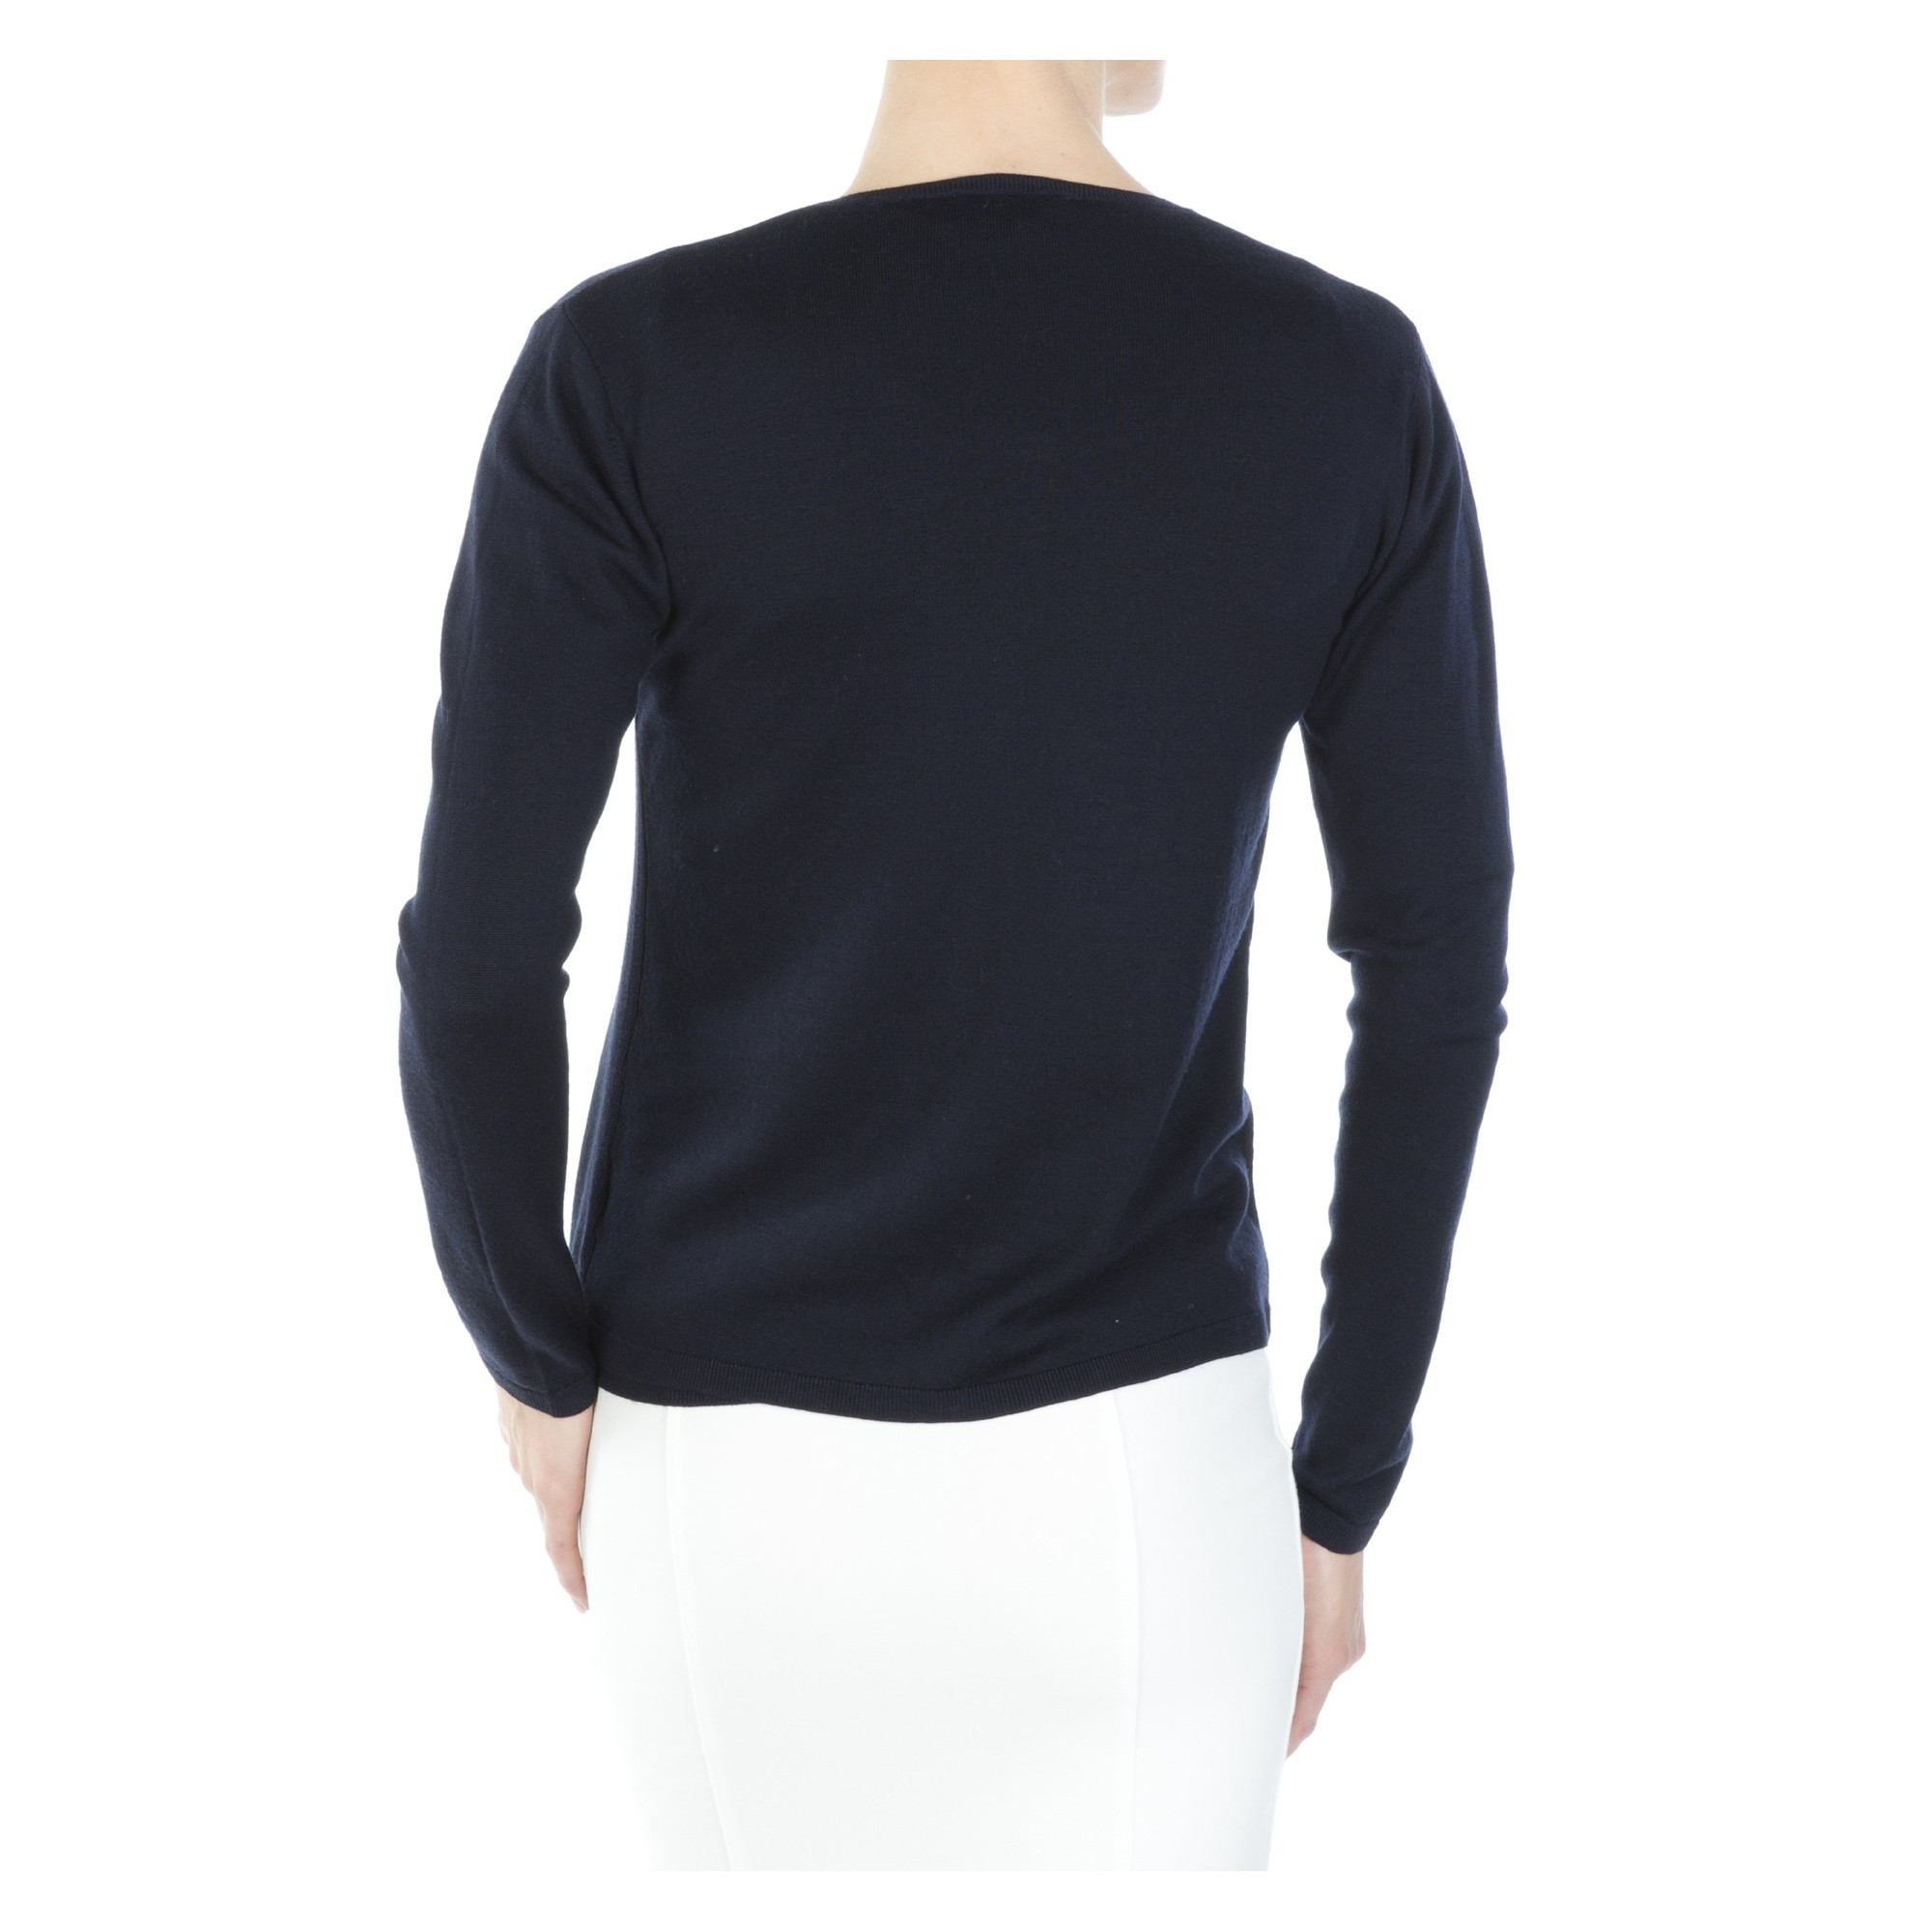 cardigan en laine femme sweater tunic. Black Bedroom Furniture Sets. Home Design Ideas